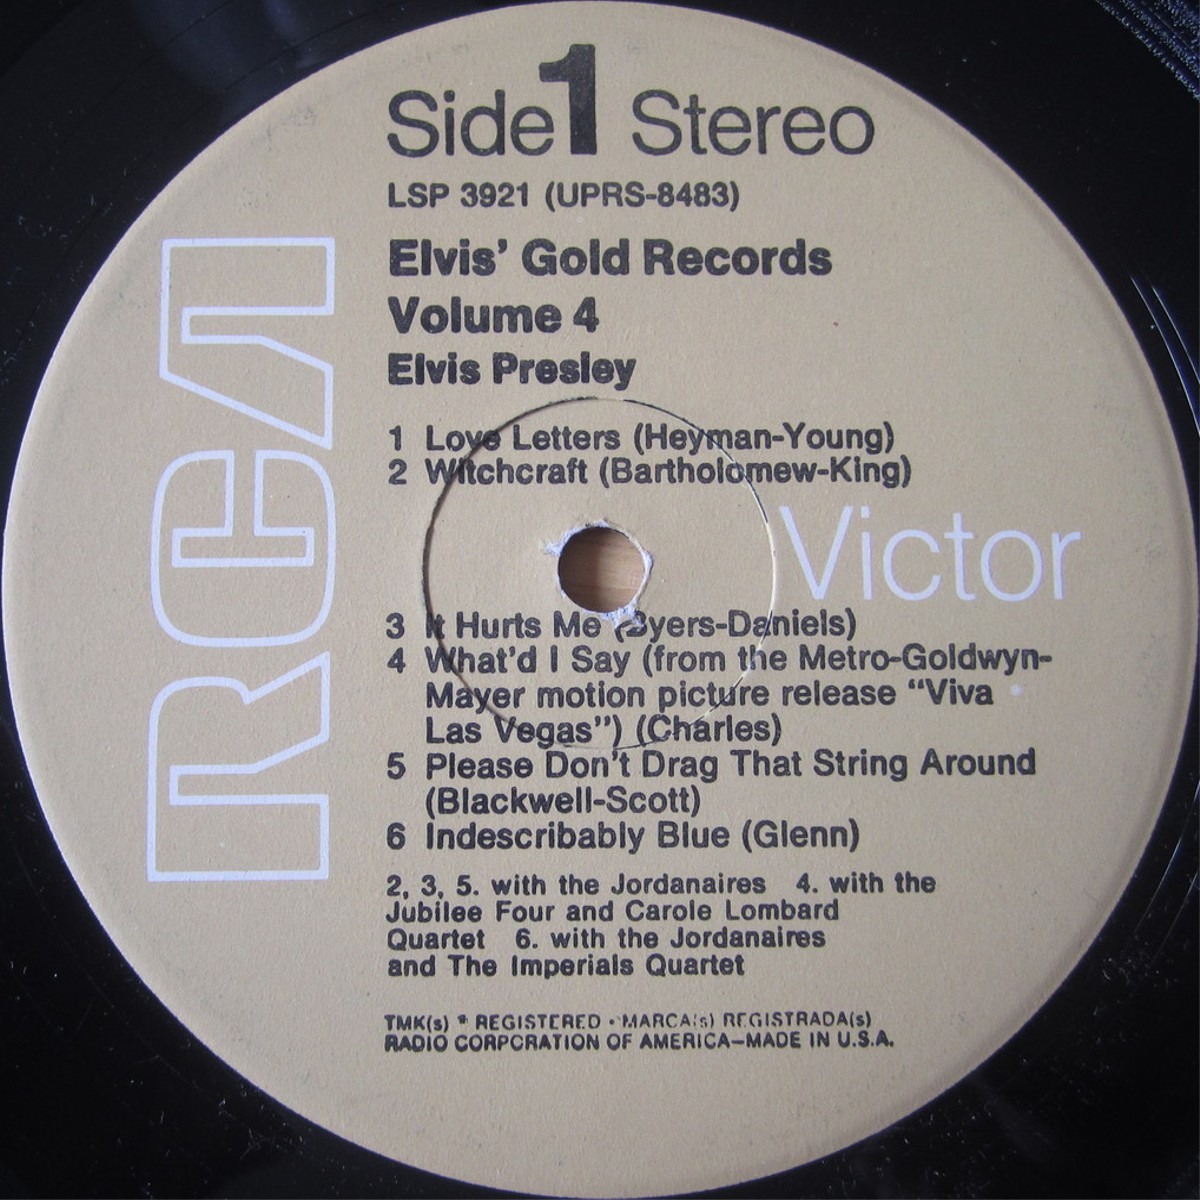 ELVIS' GOLD RECORDS VOL 4 Lsp3921cexum4